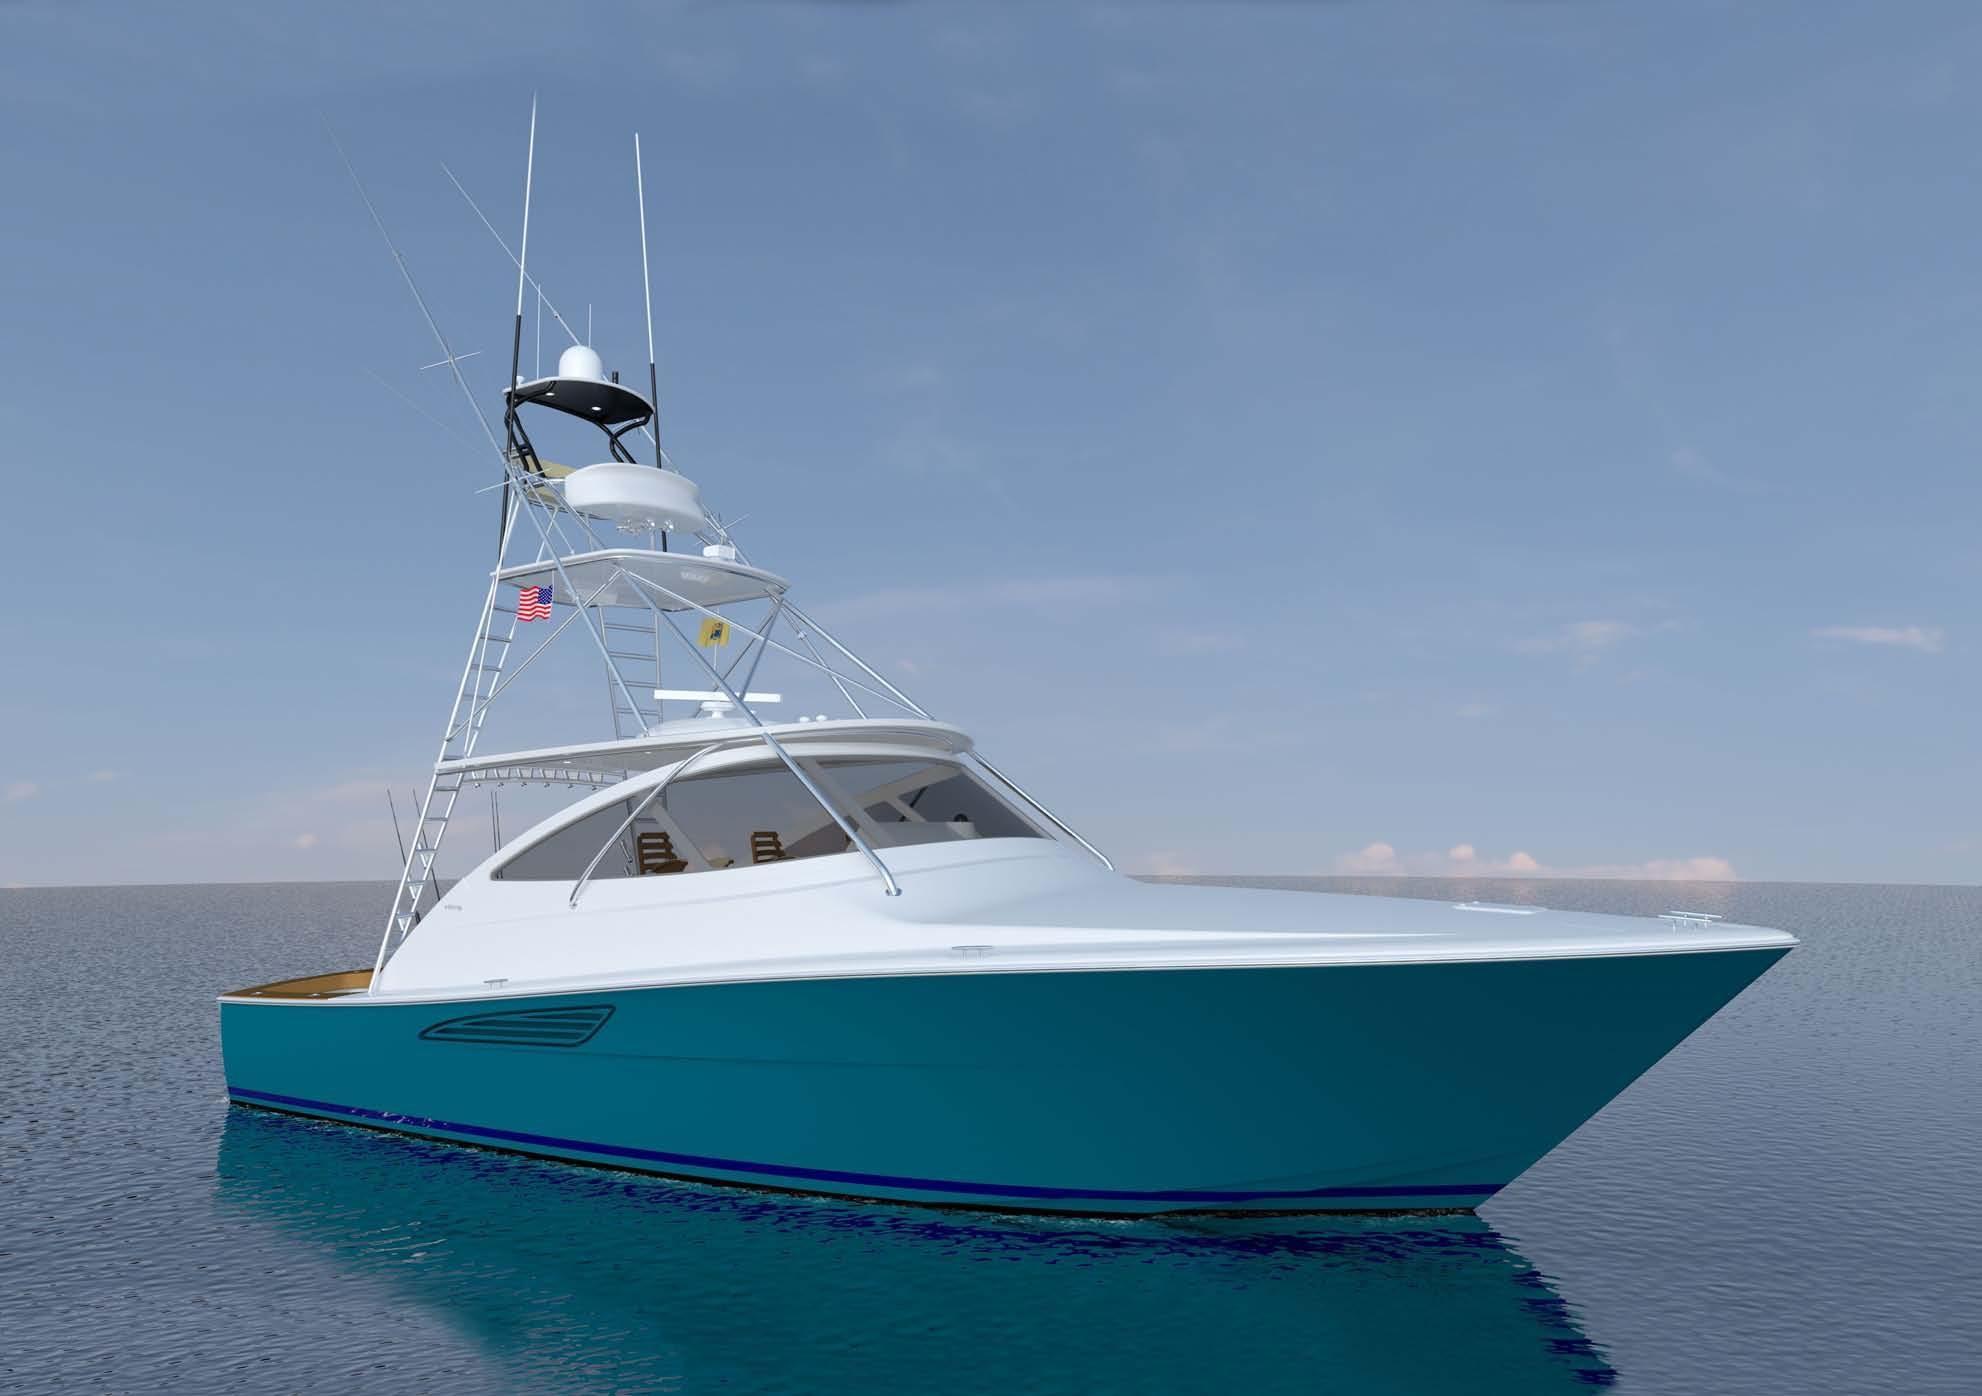 2018 Viking 44 Open Power Boat For Sale Www Yachtworld Com